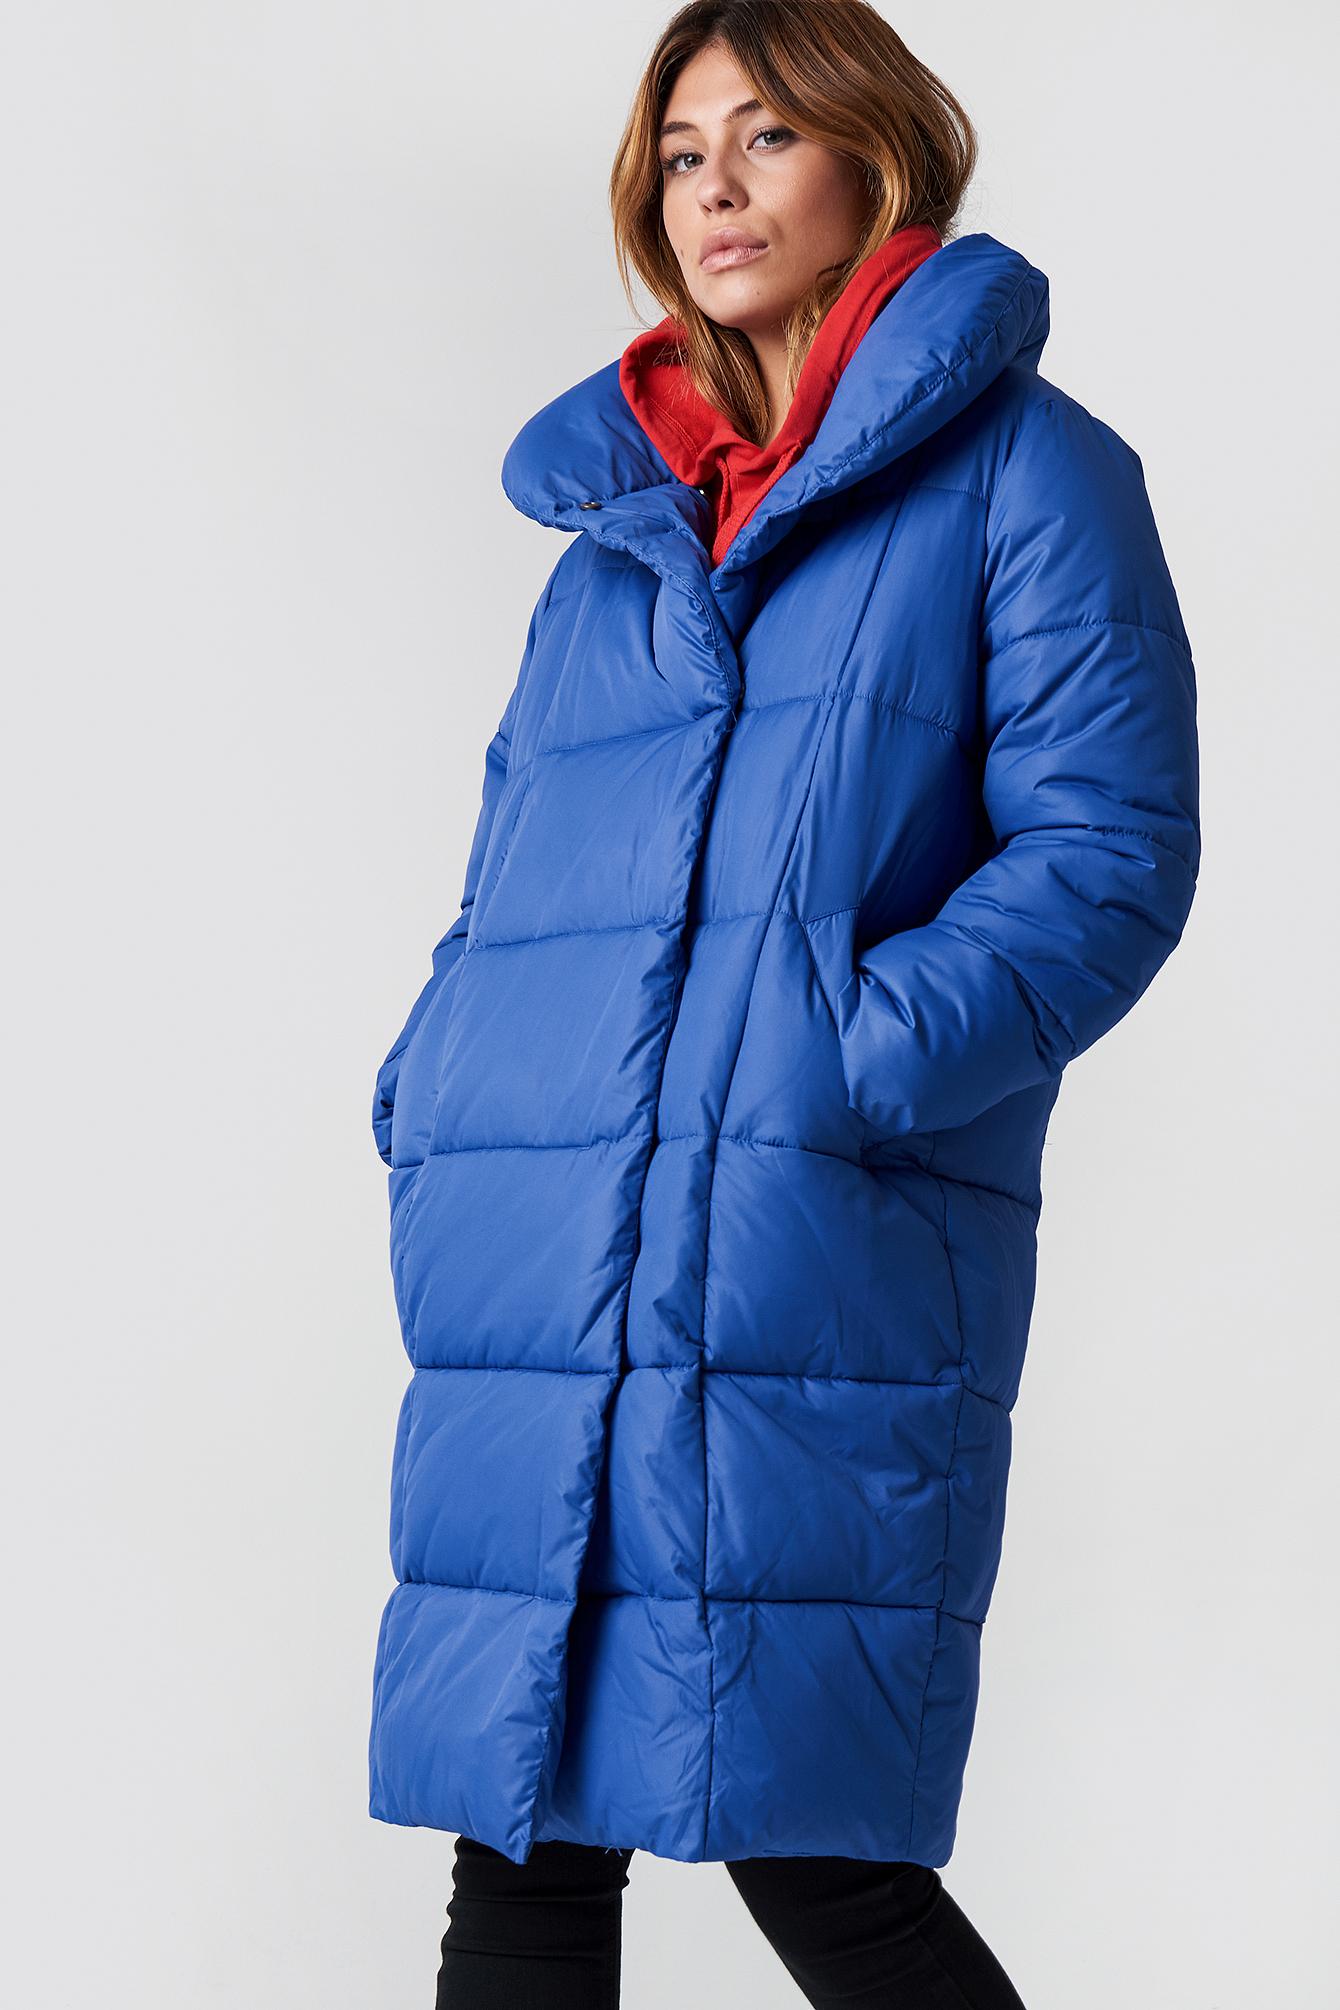 Padded Shawl Collar Jacket NA-KDLOUNGE.DE